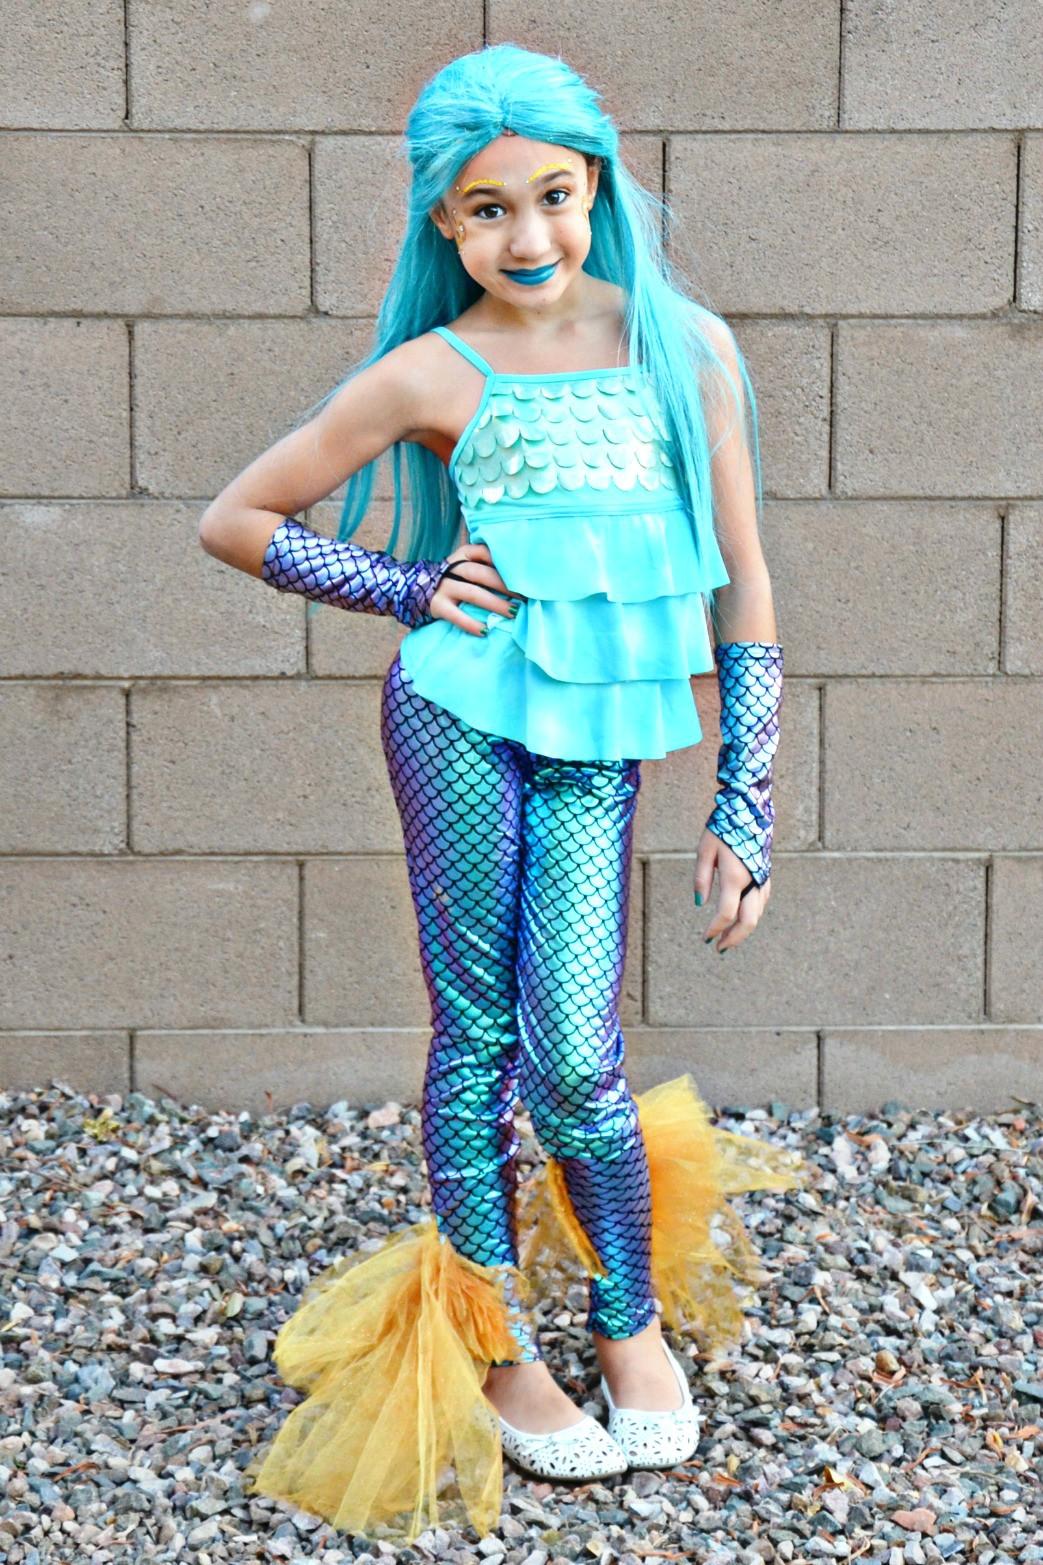 Mermaid Costume DIY  DIY Mermaid Costume learn how to add a mermaid fin tail